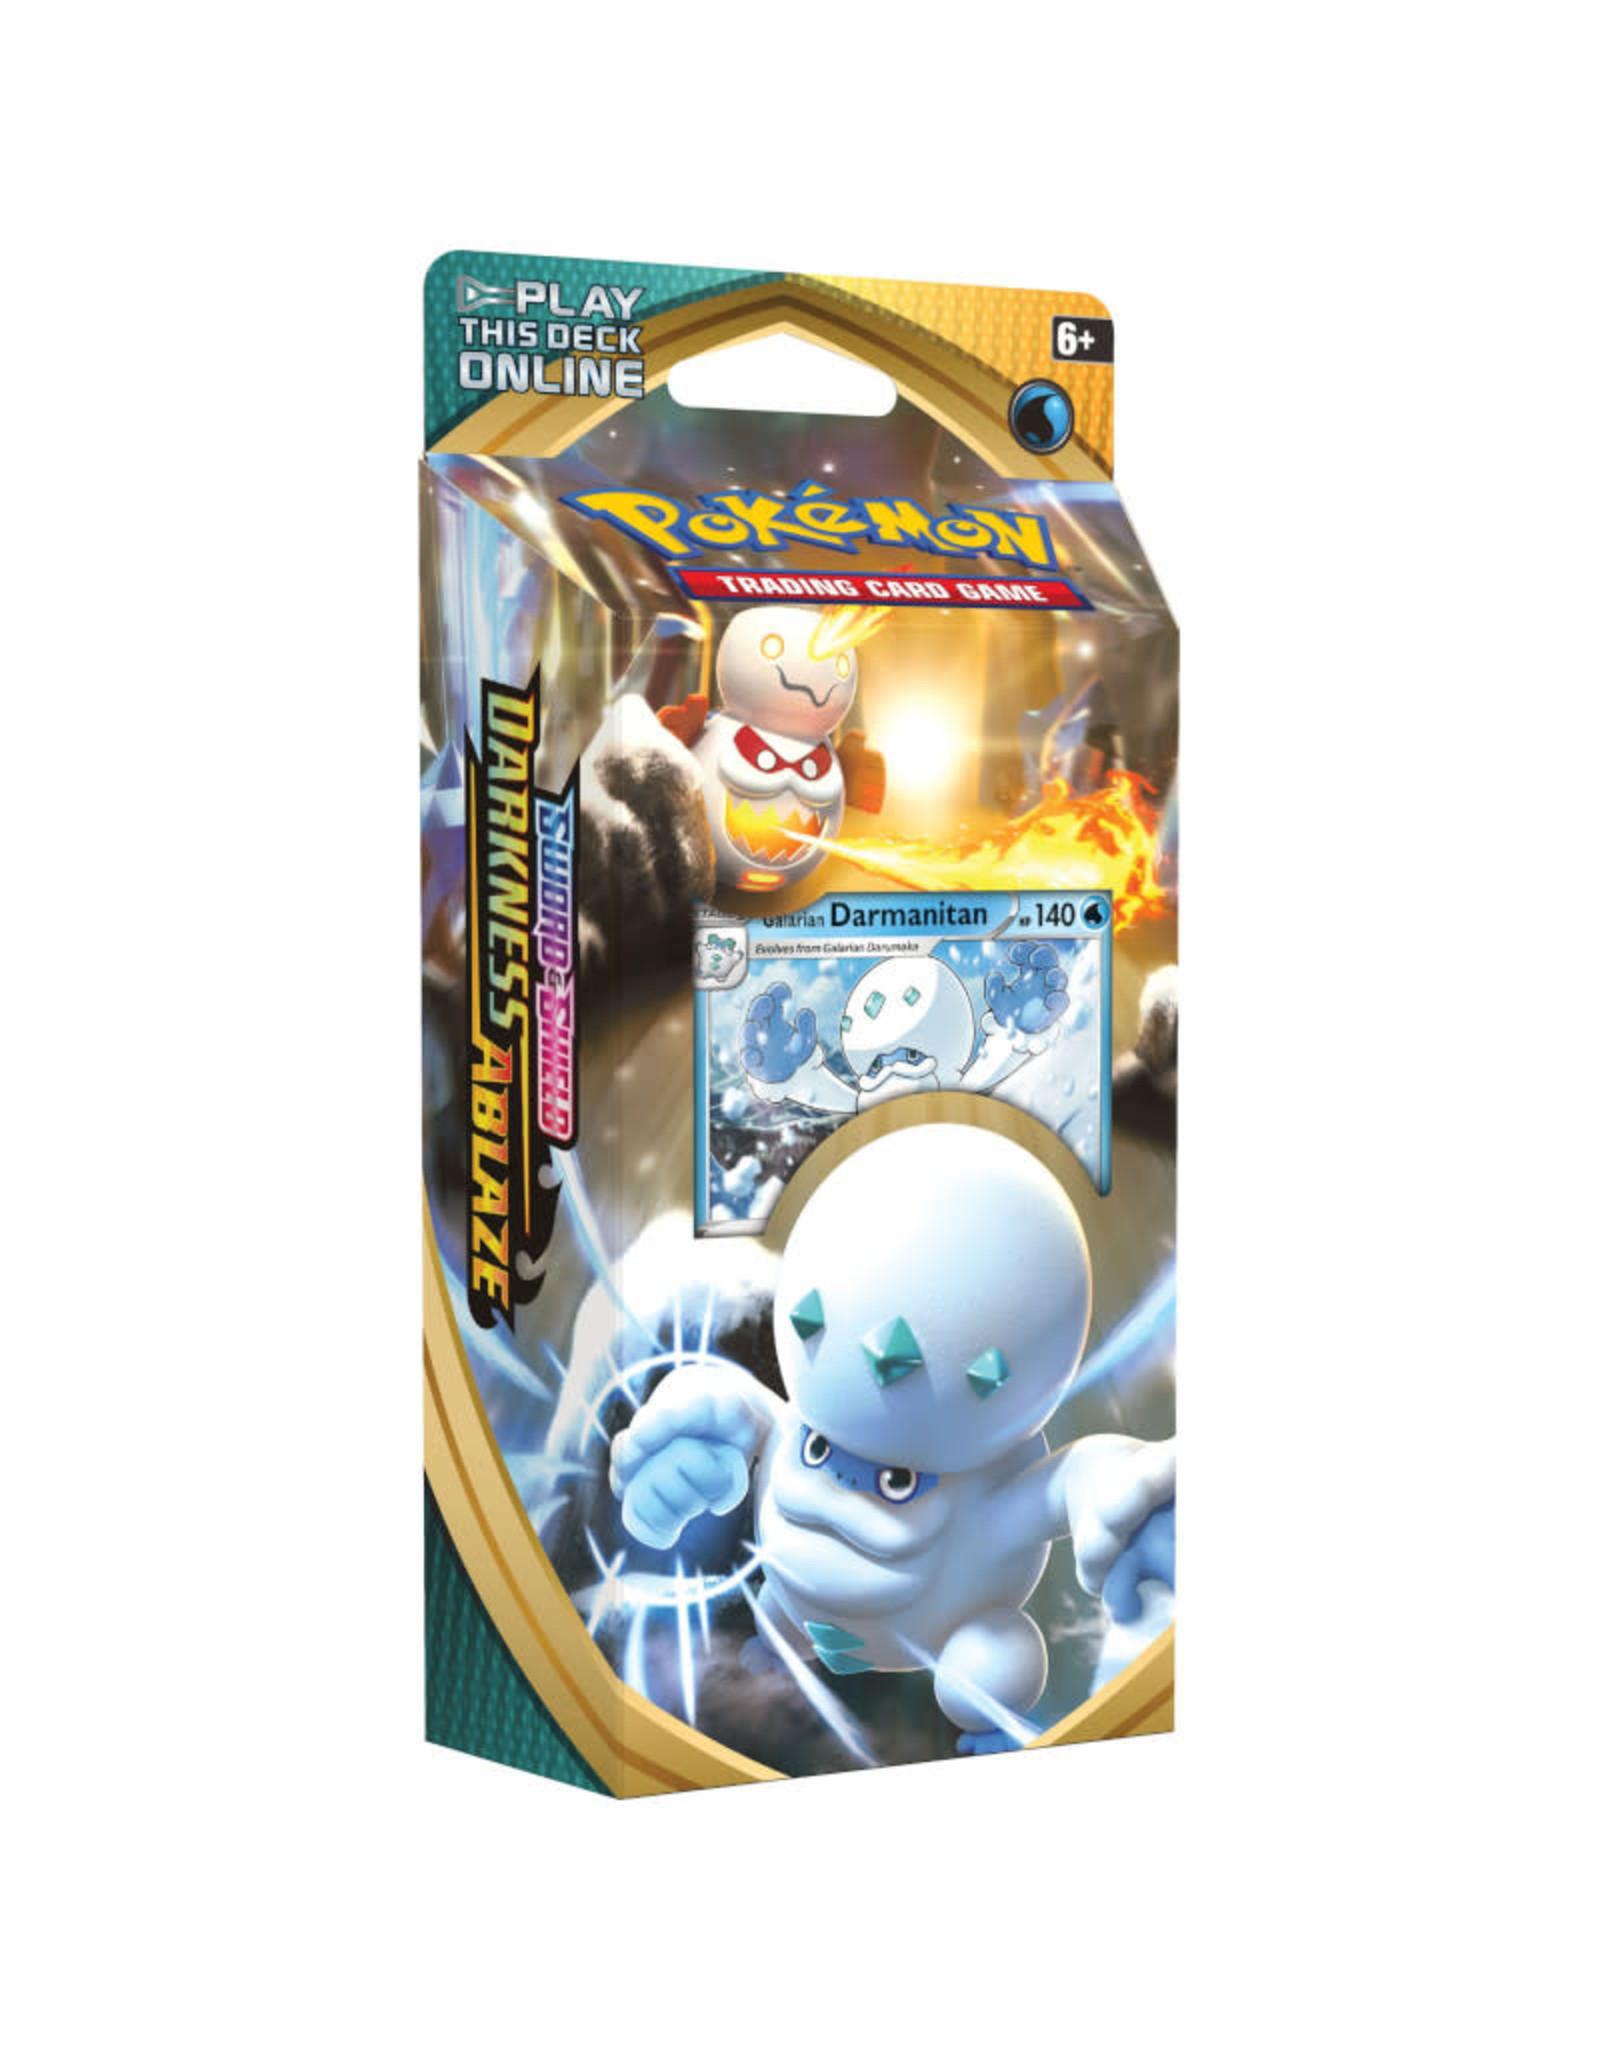 Pokemon Pokemon Darkness Ablaze Theme Deck - Galarian Darmanitan (Pre-Order)